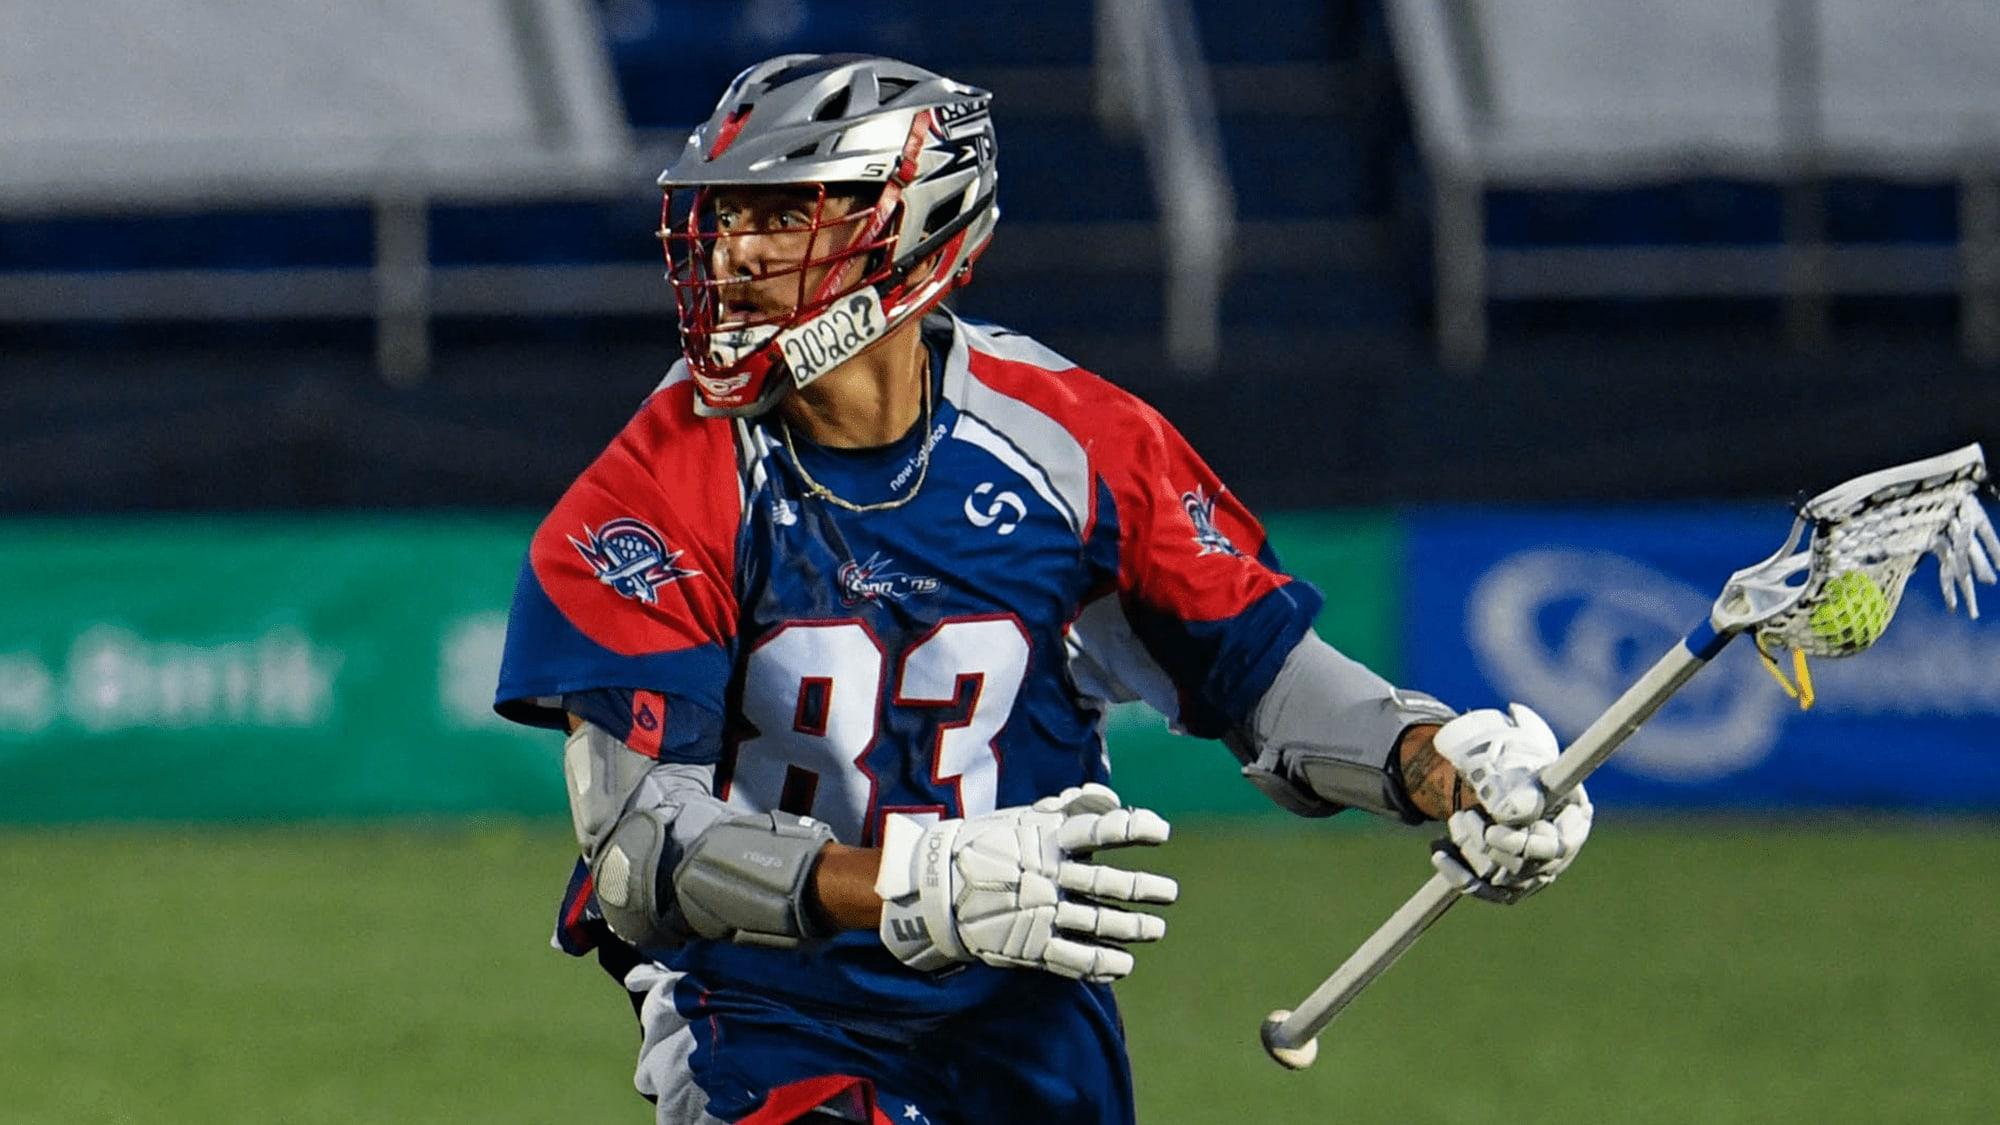 Don't Take Lacrosse Away From Us, the Haudenosaunee Randy Staats Boston Cannons MLL Major League Lacrosse